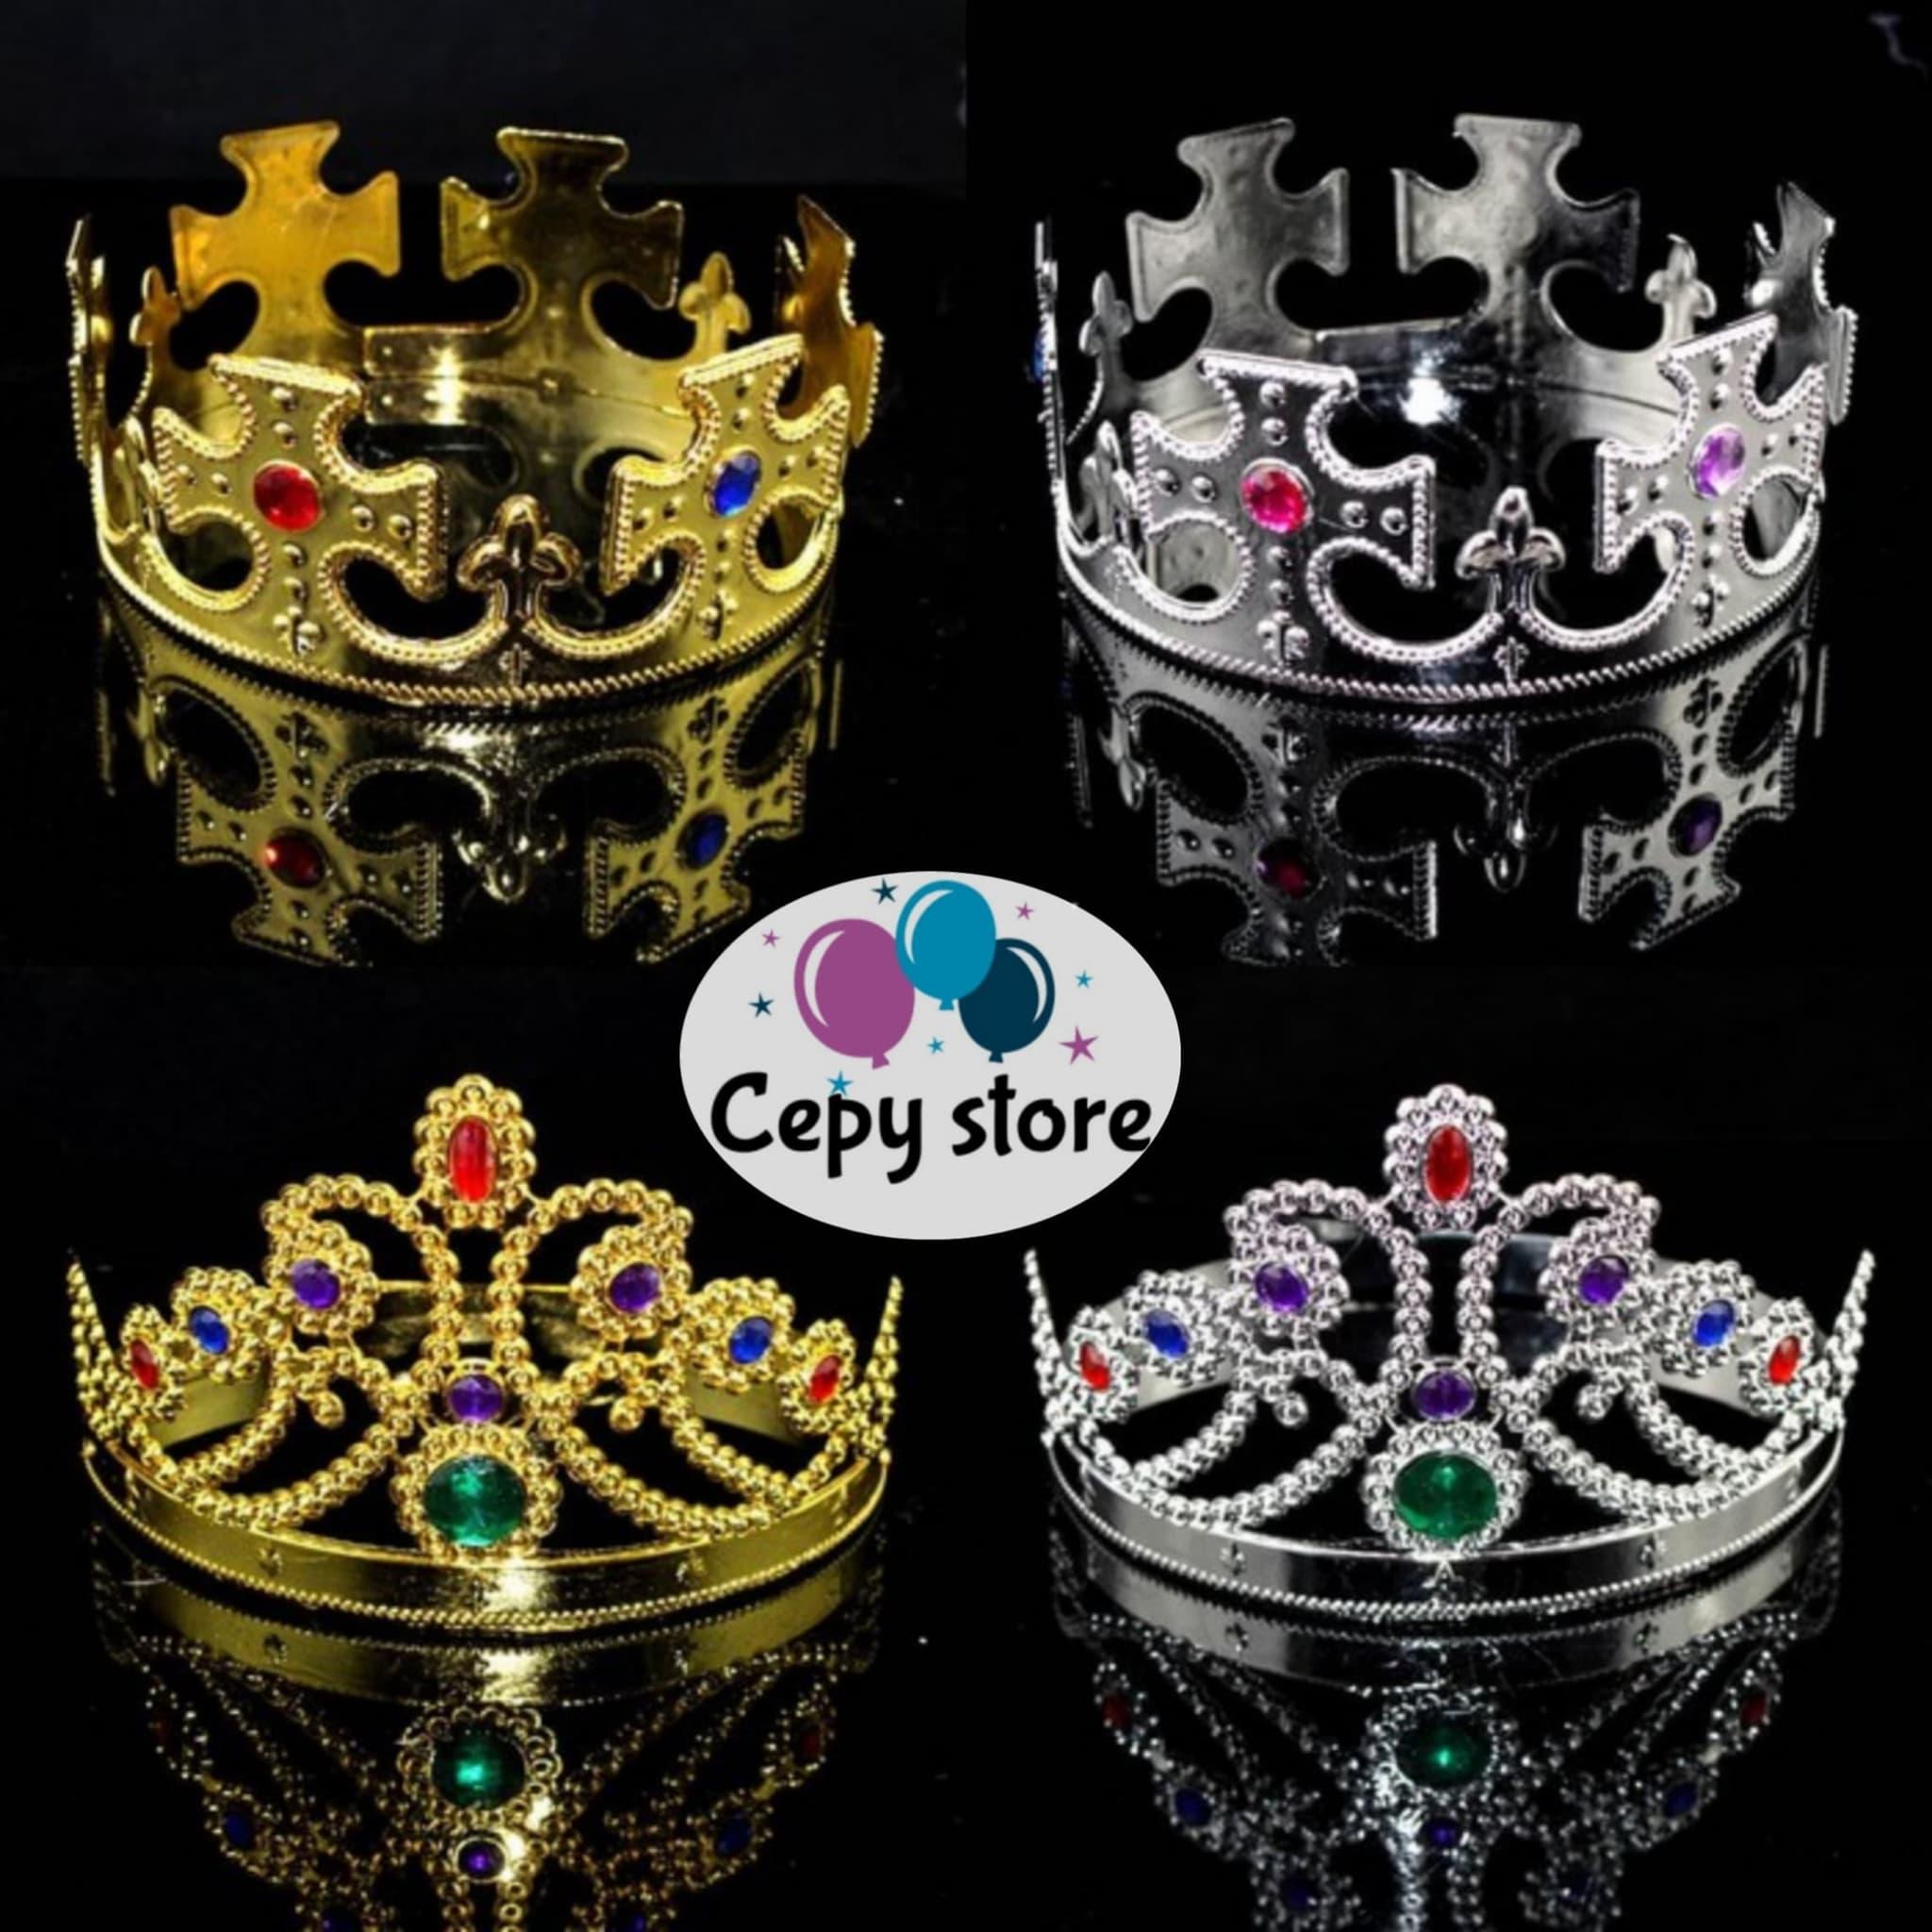 Mahkota Pesta Ratu, Crown Party King Queen ( Gold & Silver) thumbnail